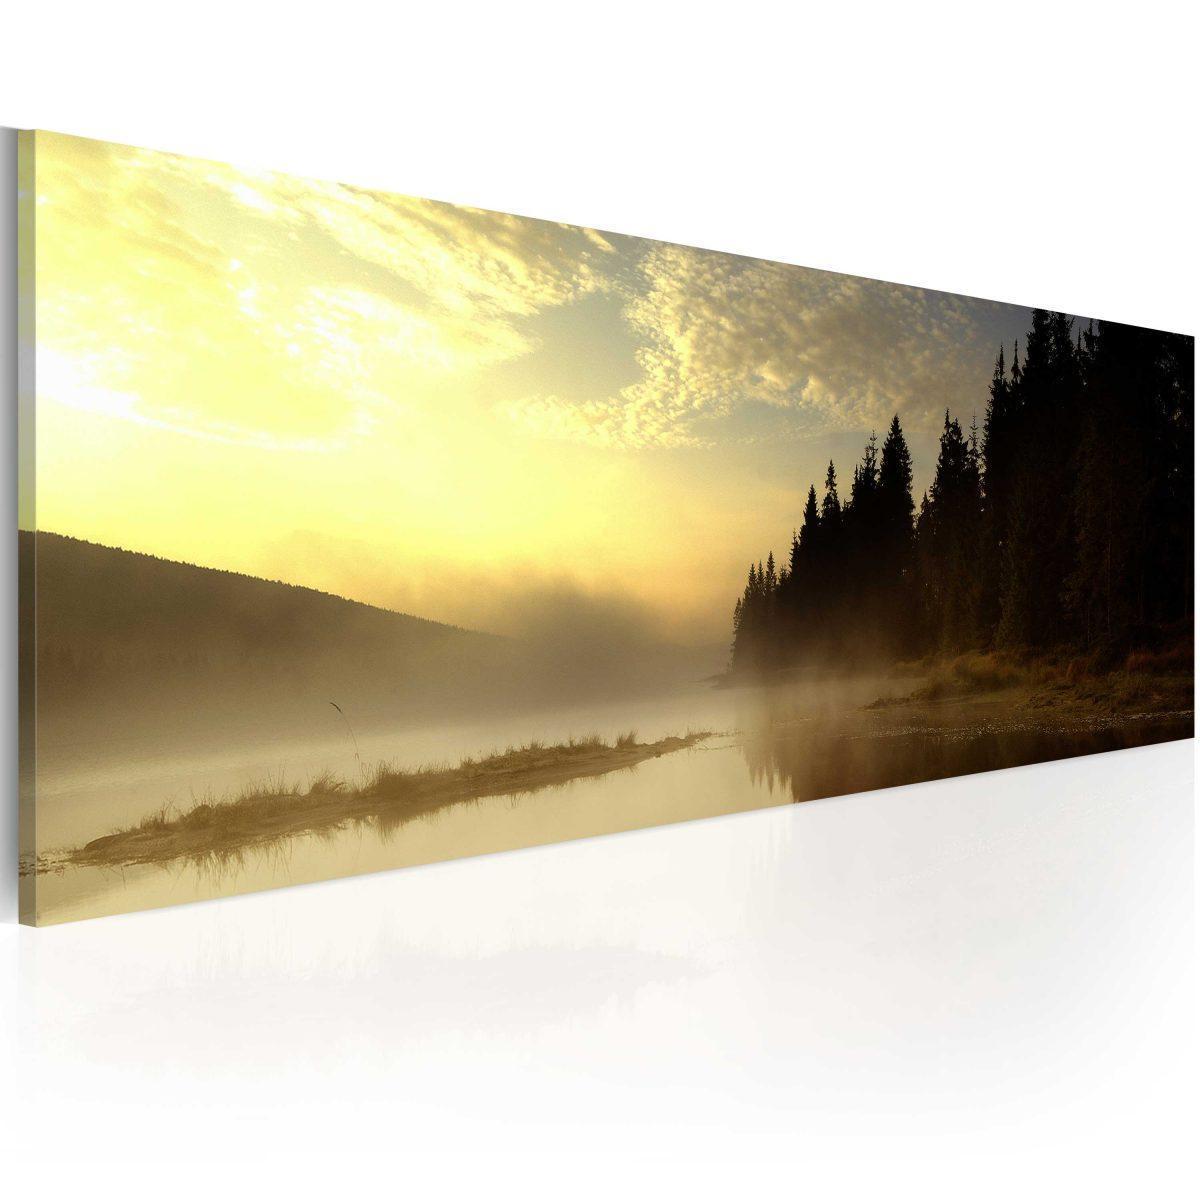 Canvas Tavla - Dimma över en sjö - 135x45